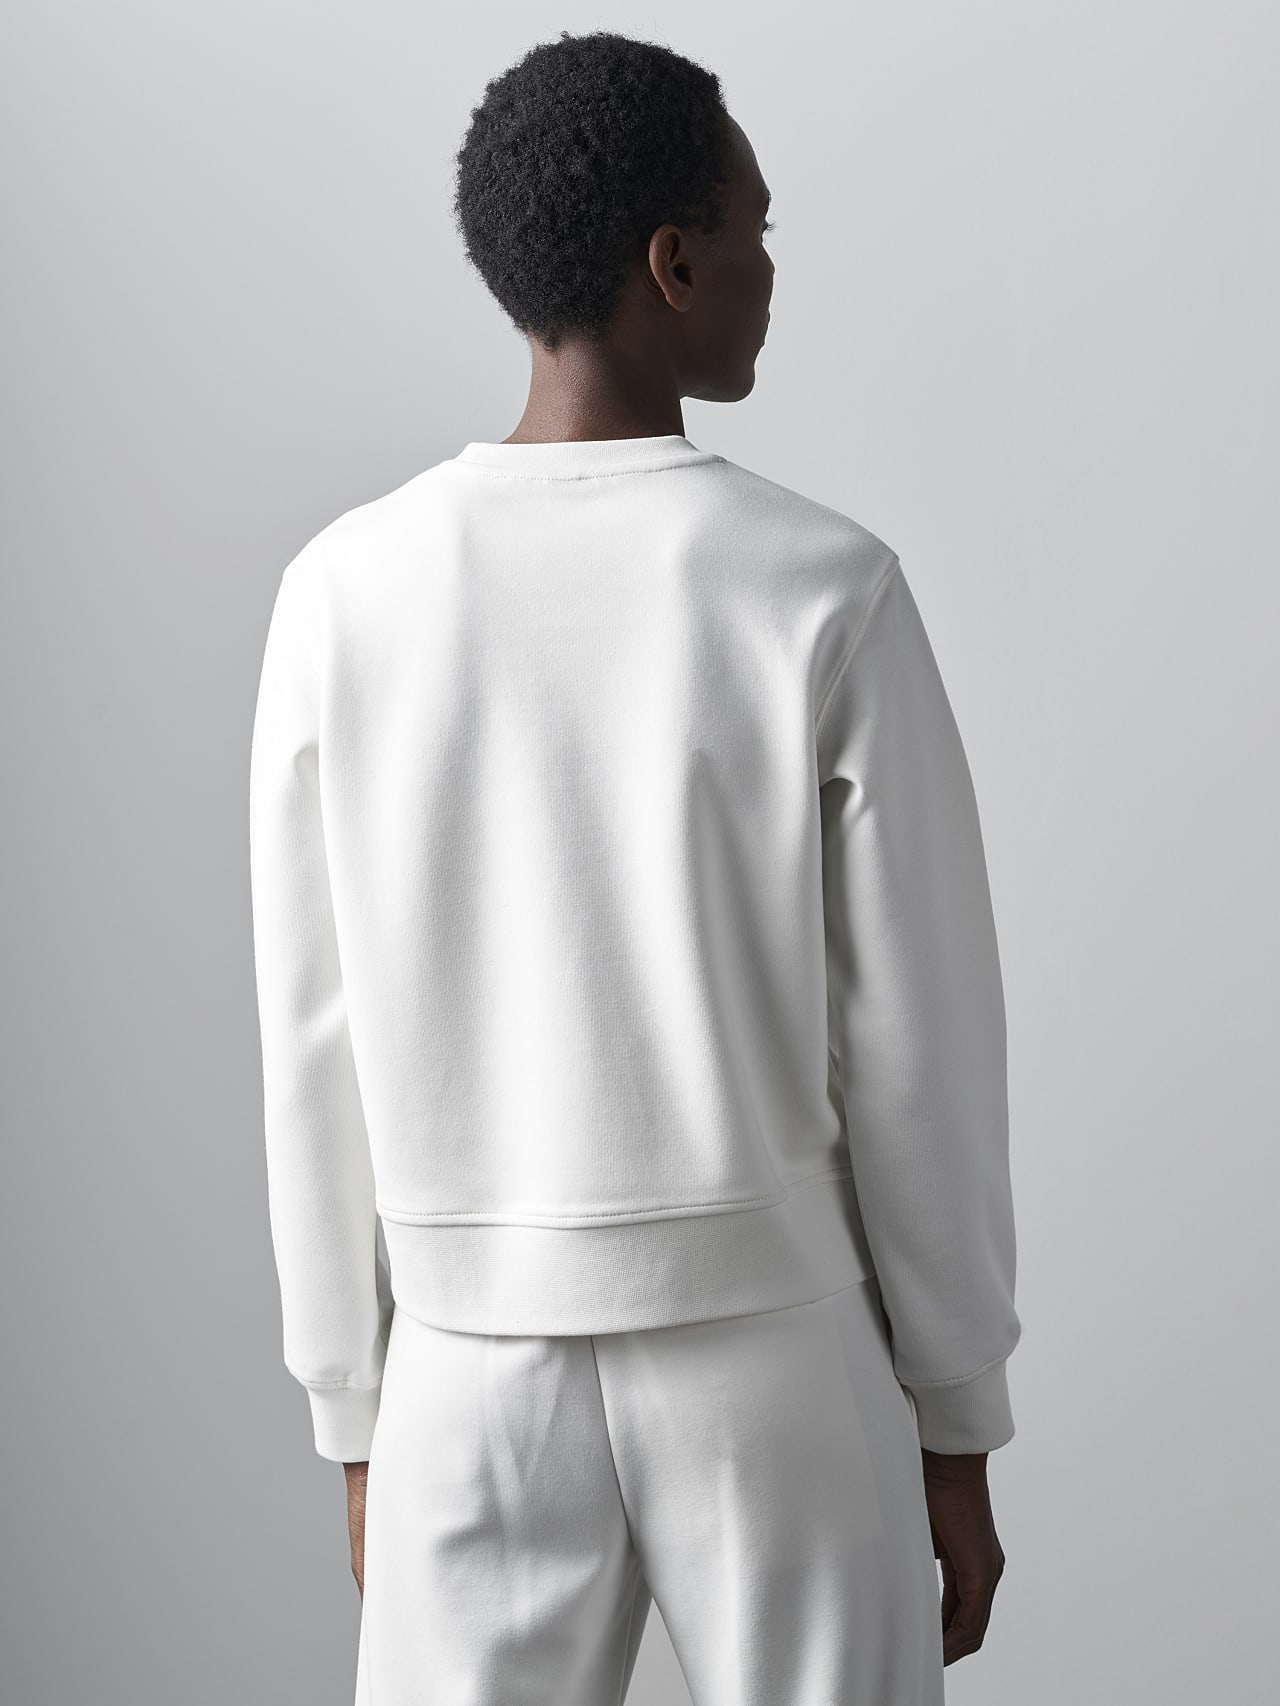 SHINT V1.Y5.02 Premium Logo Sweater offwhite Front Main Alpha Tauri